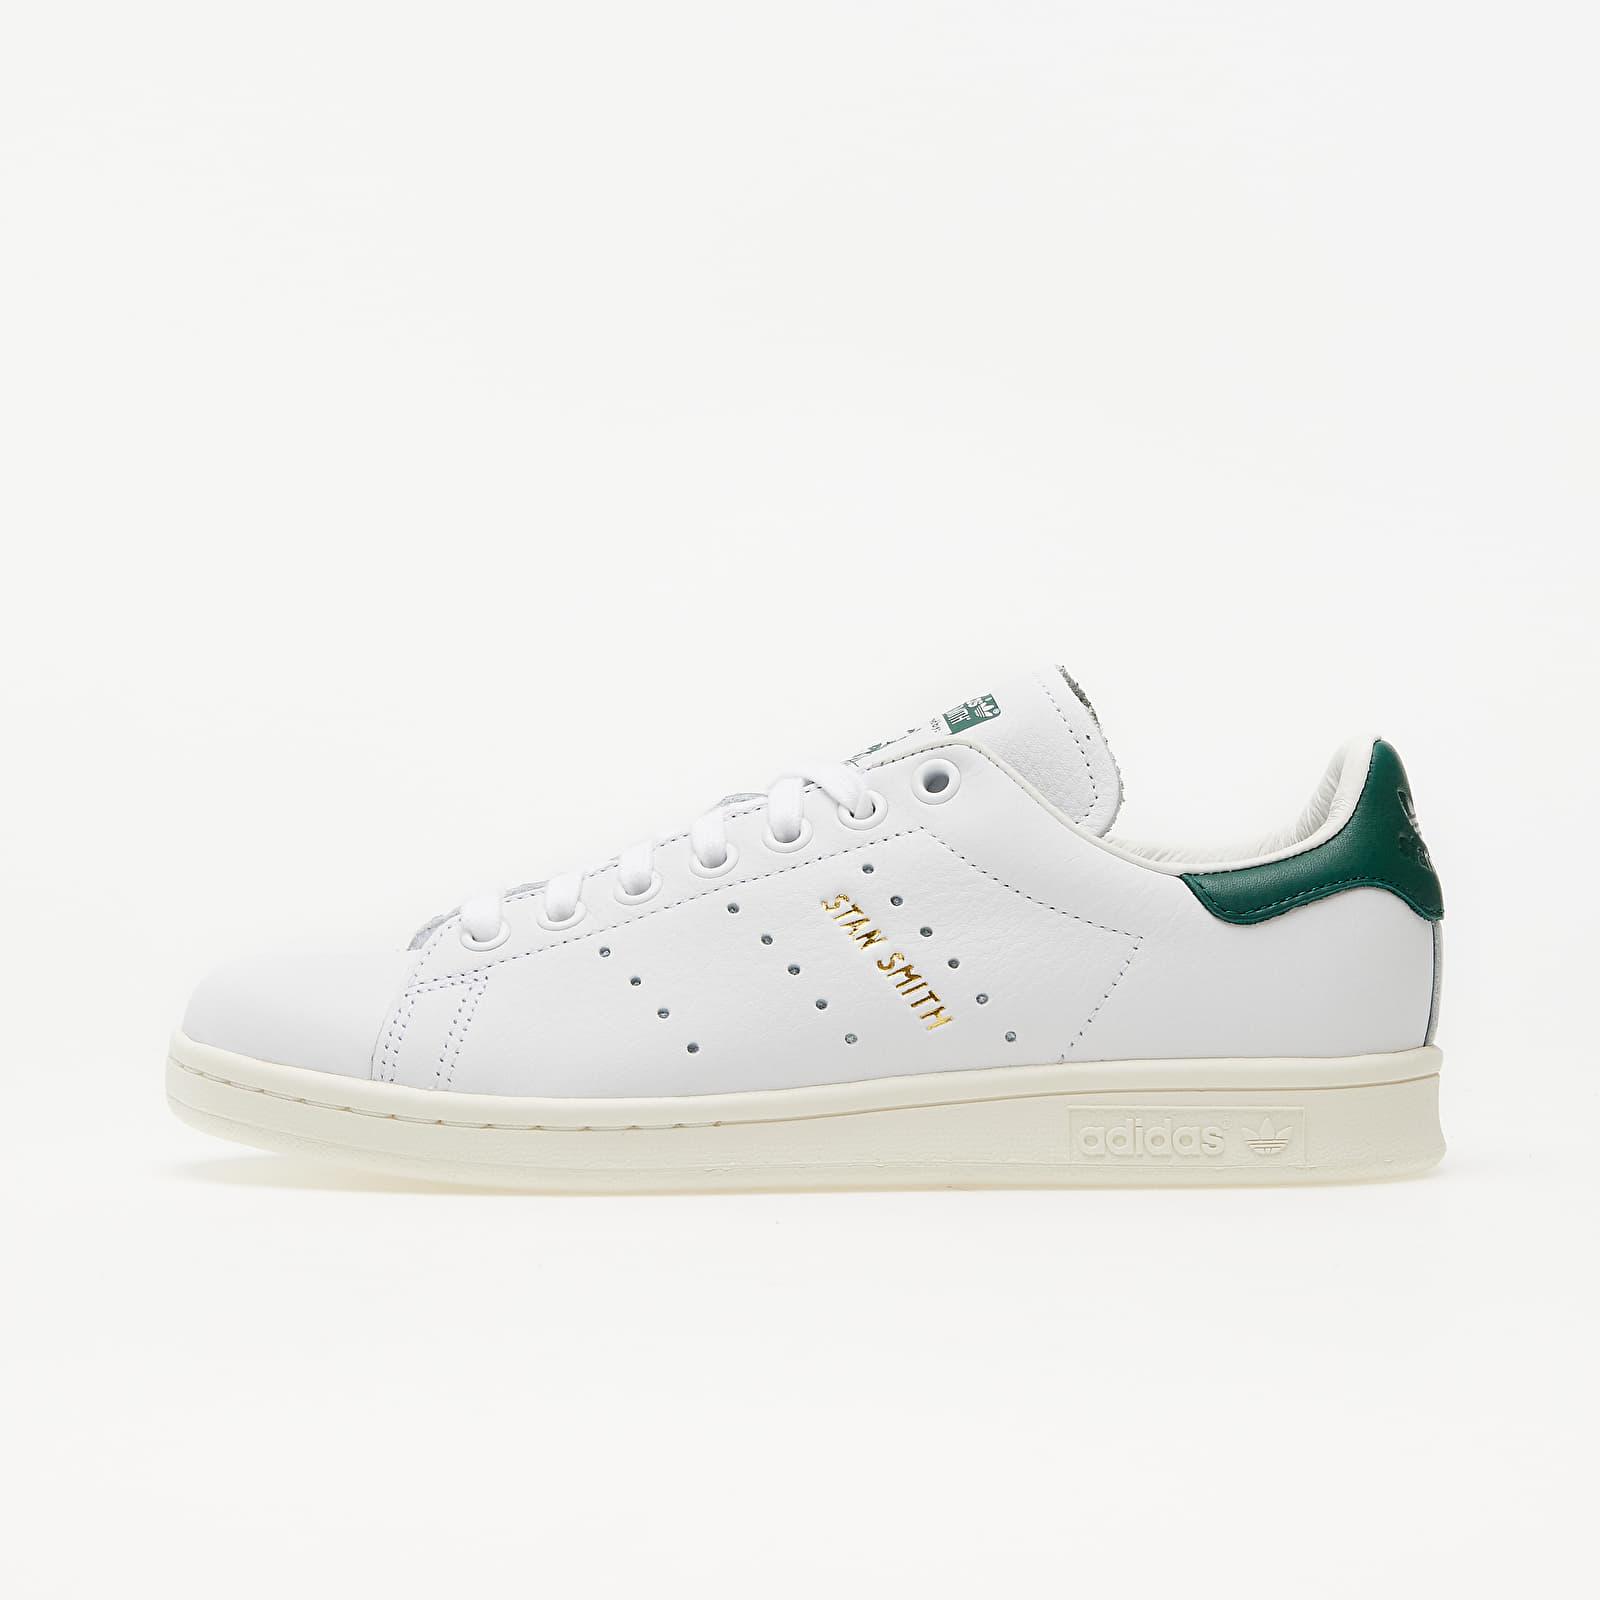 Zapatillas Hombre adidas Stan Smith Ftw White/ Ftw White/ Collegiate Green